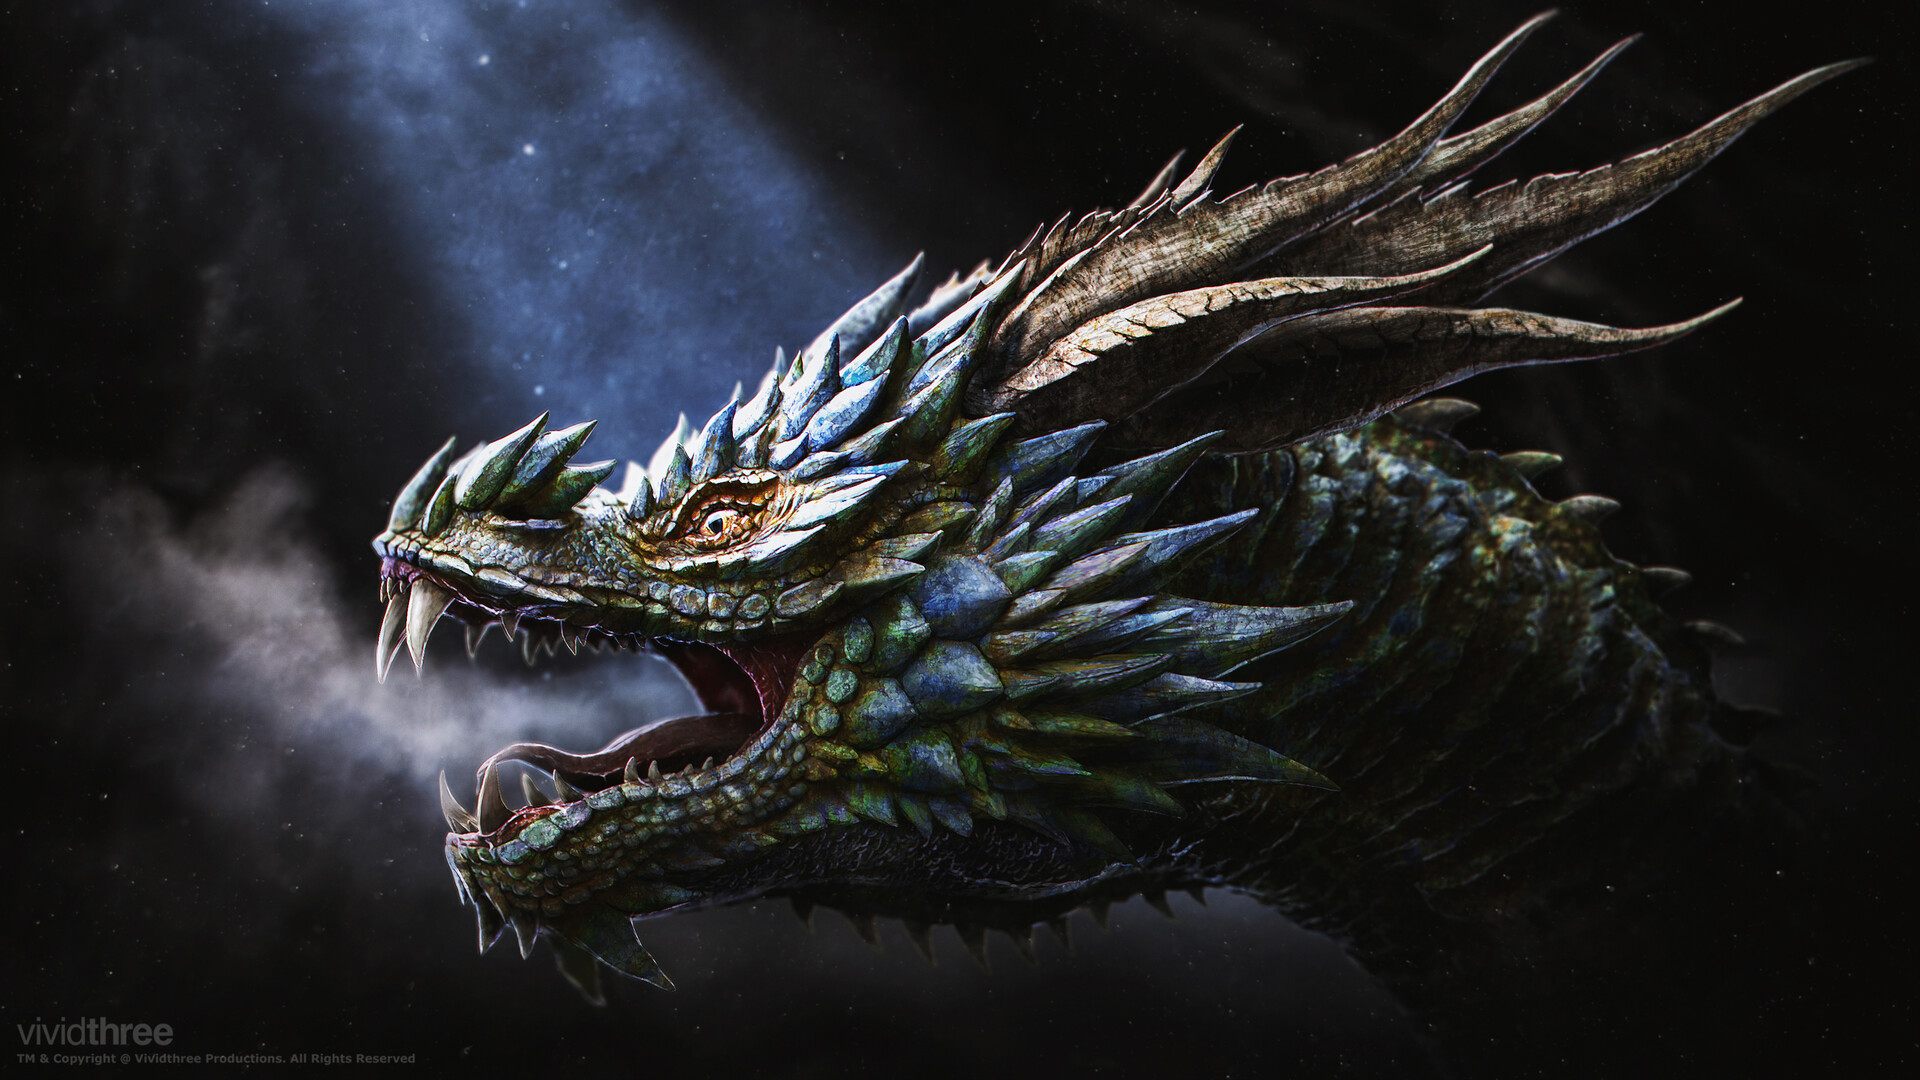 Jia hao 2019 dragonbust 01 comp 01